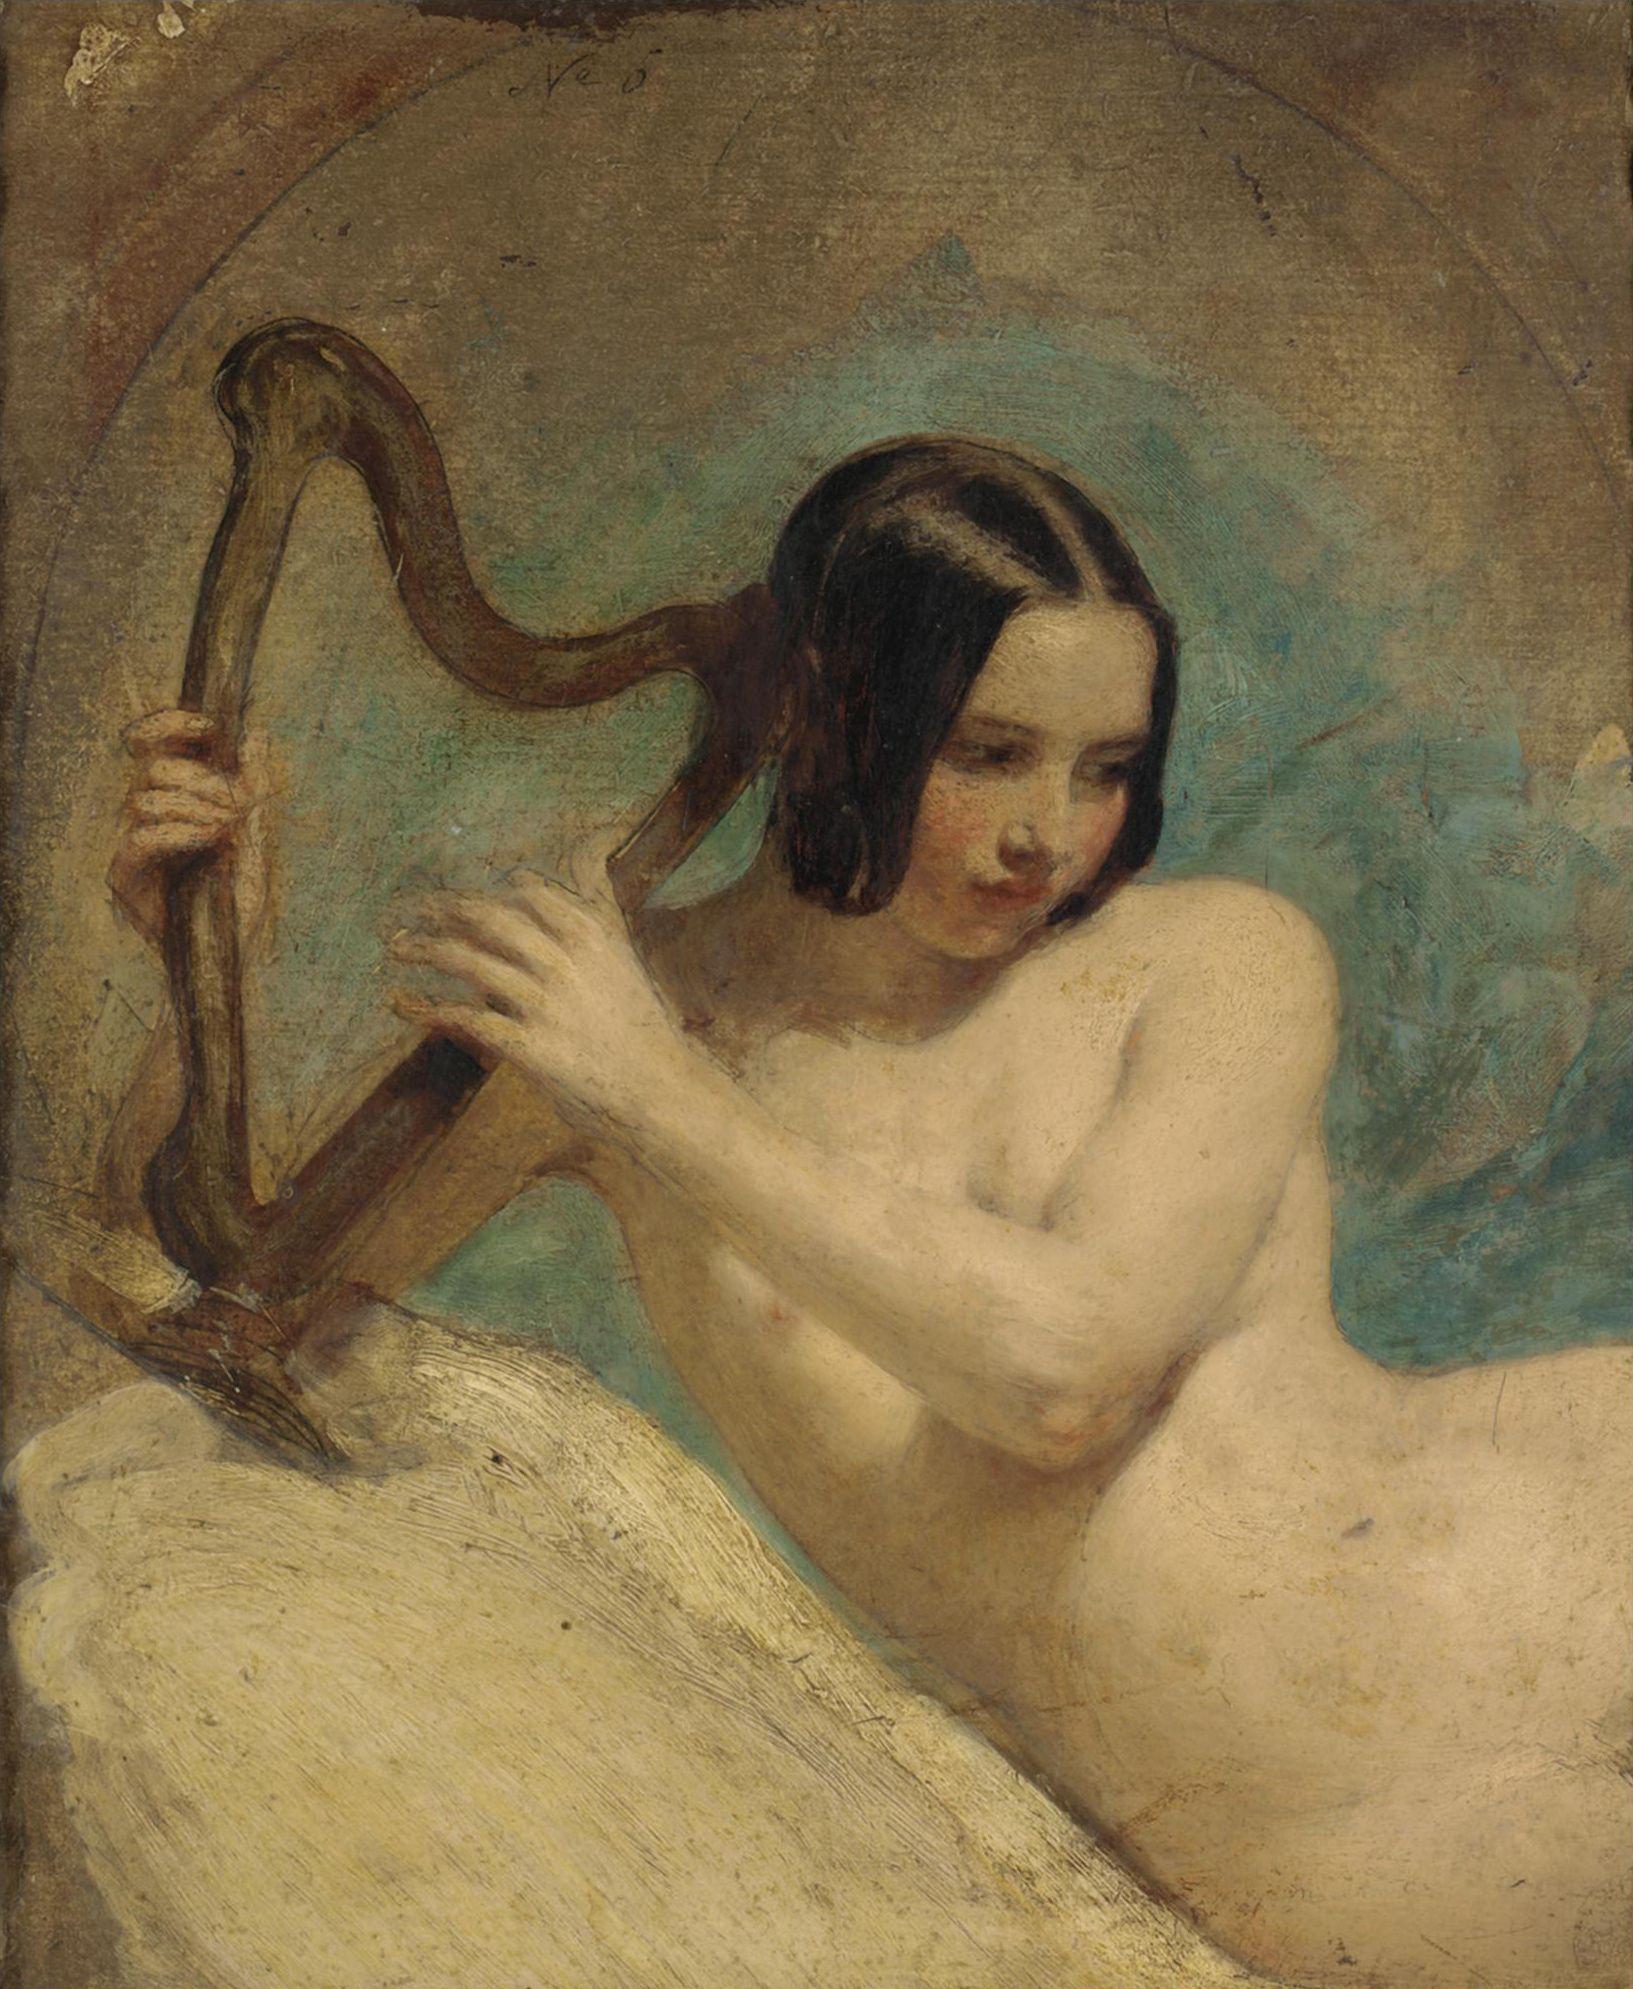 William Edward Frost, 1810-1877. Терпсихора.33 х 28 см. частная коллекция